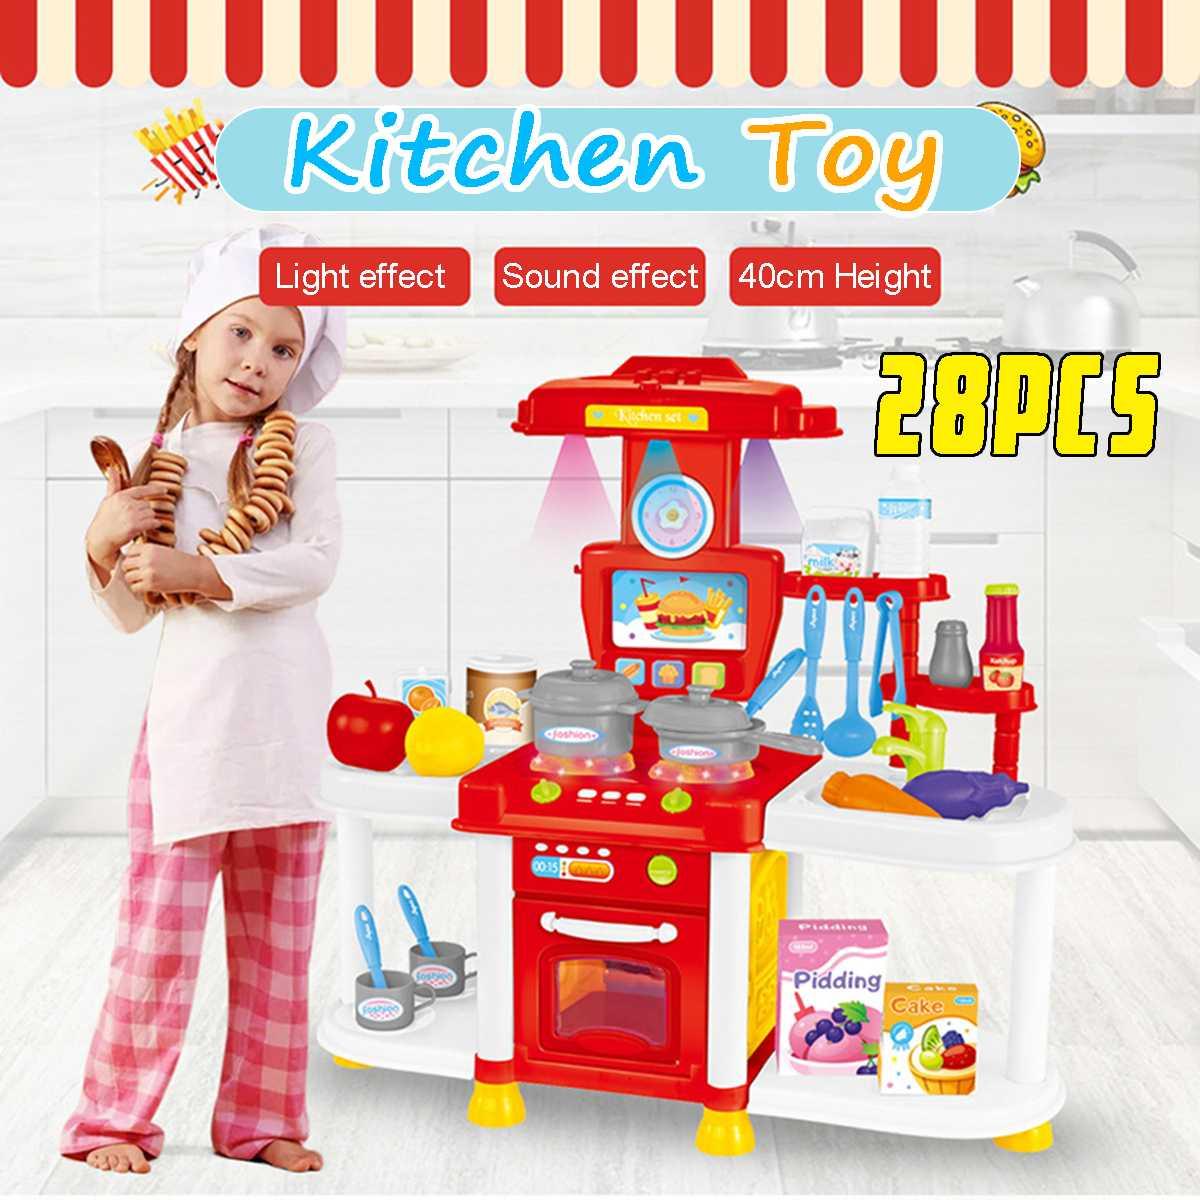 New Kids Kitchen Toy Simulation Kitchen Toy Light/Music Dinnerware Pretend Play Cooking Table Set Children Gift Cozinha Infantil